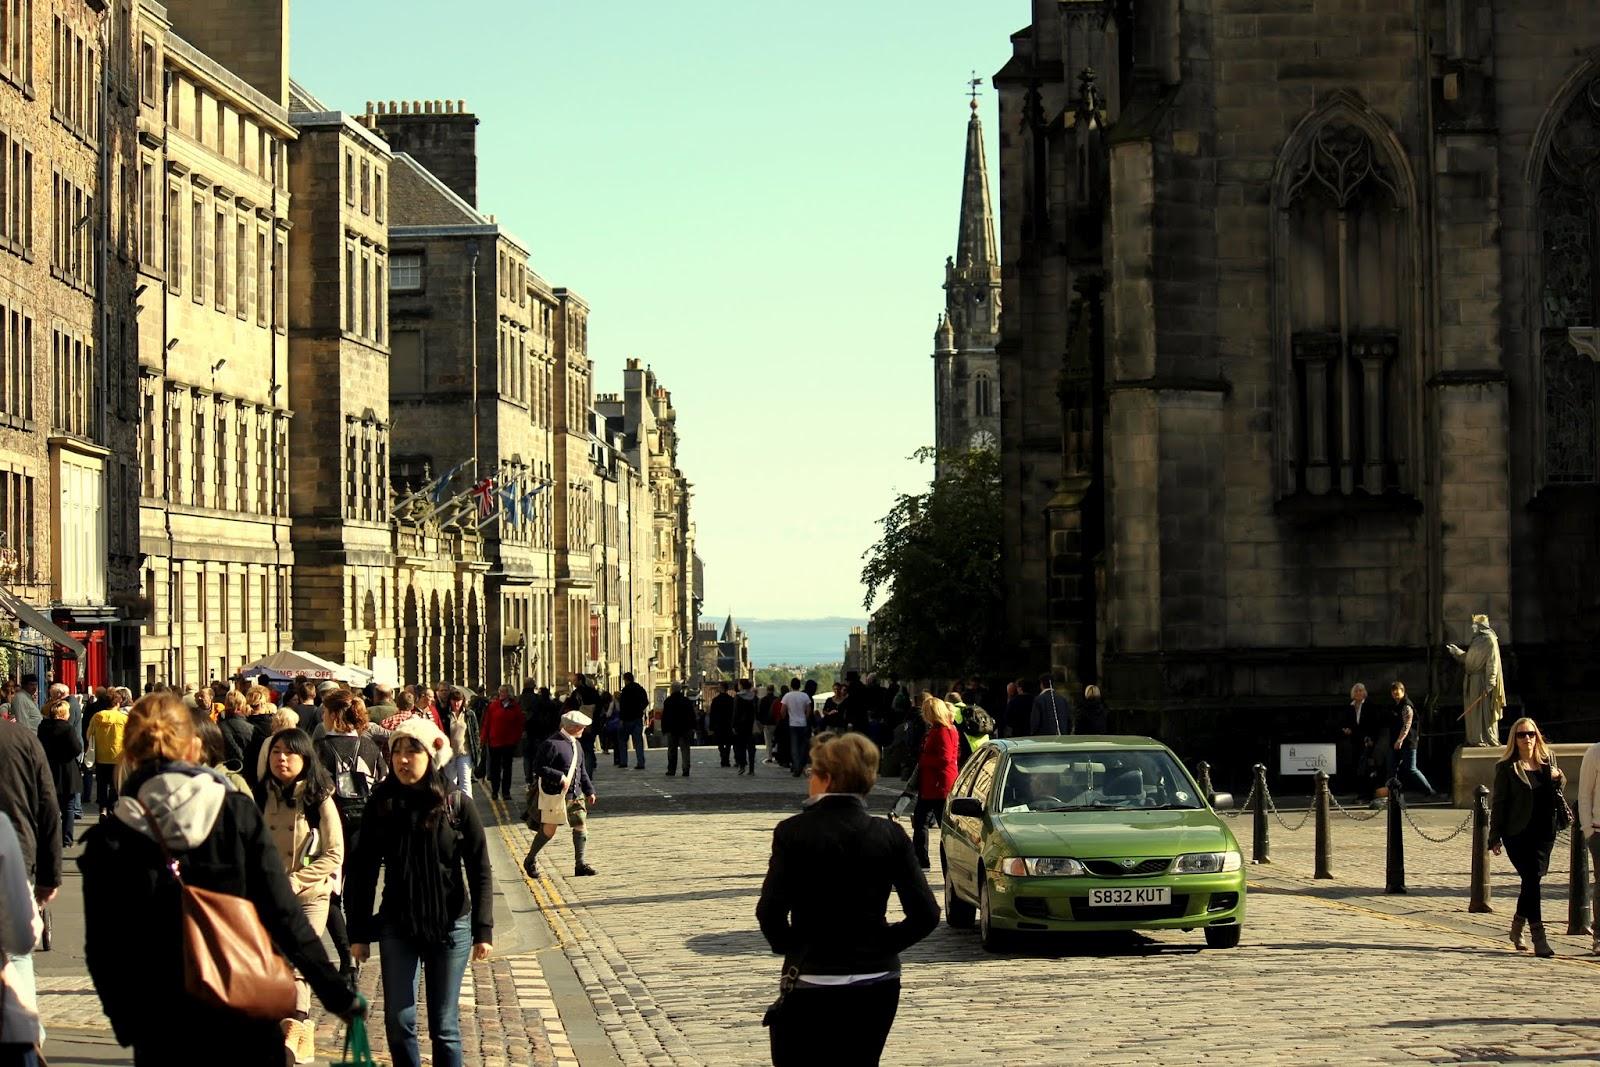 Walking down the Royal Mile in Edinburgh